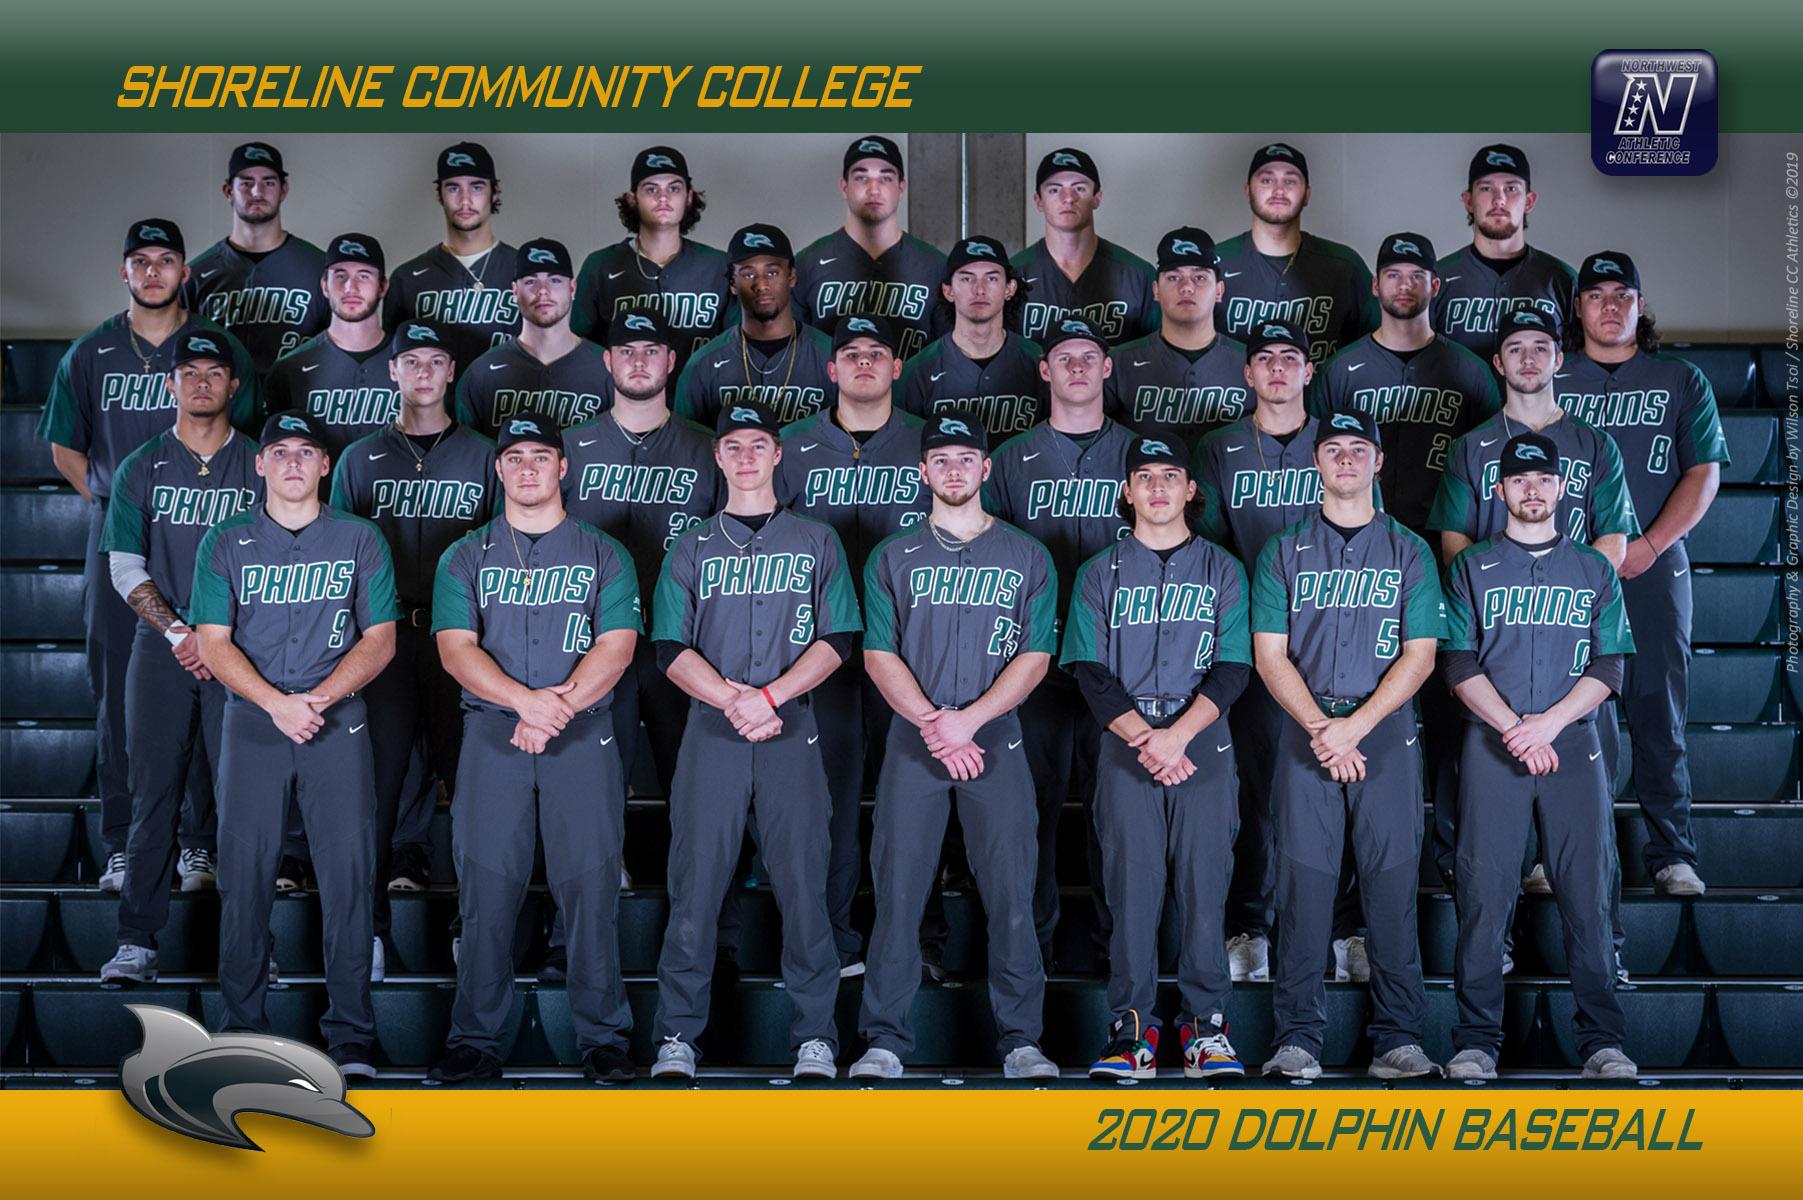 Baseball Shoreline Community College